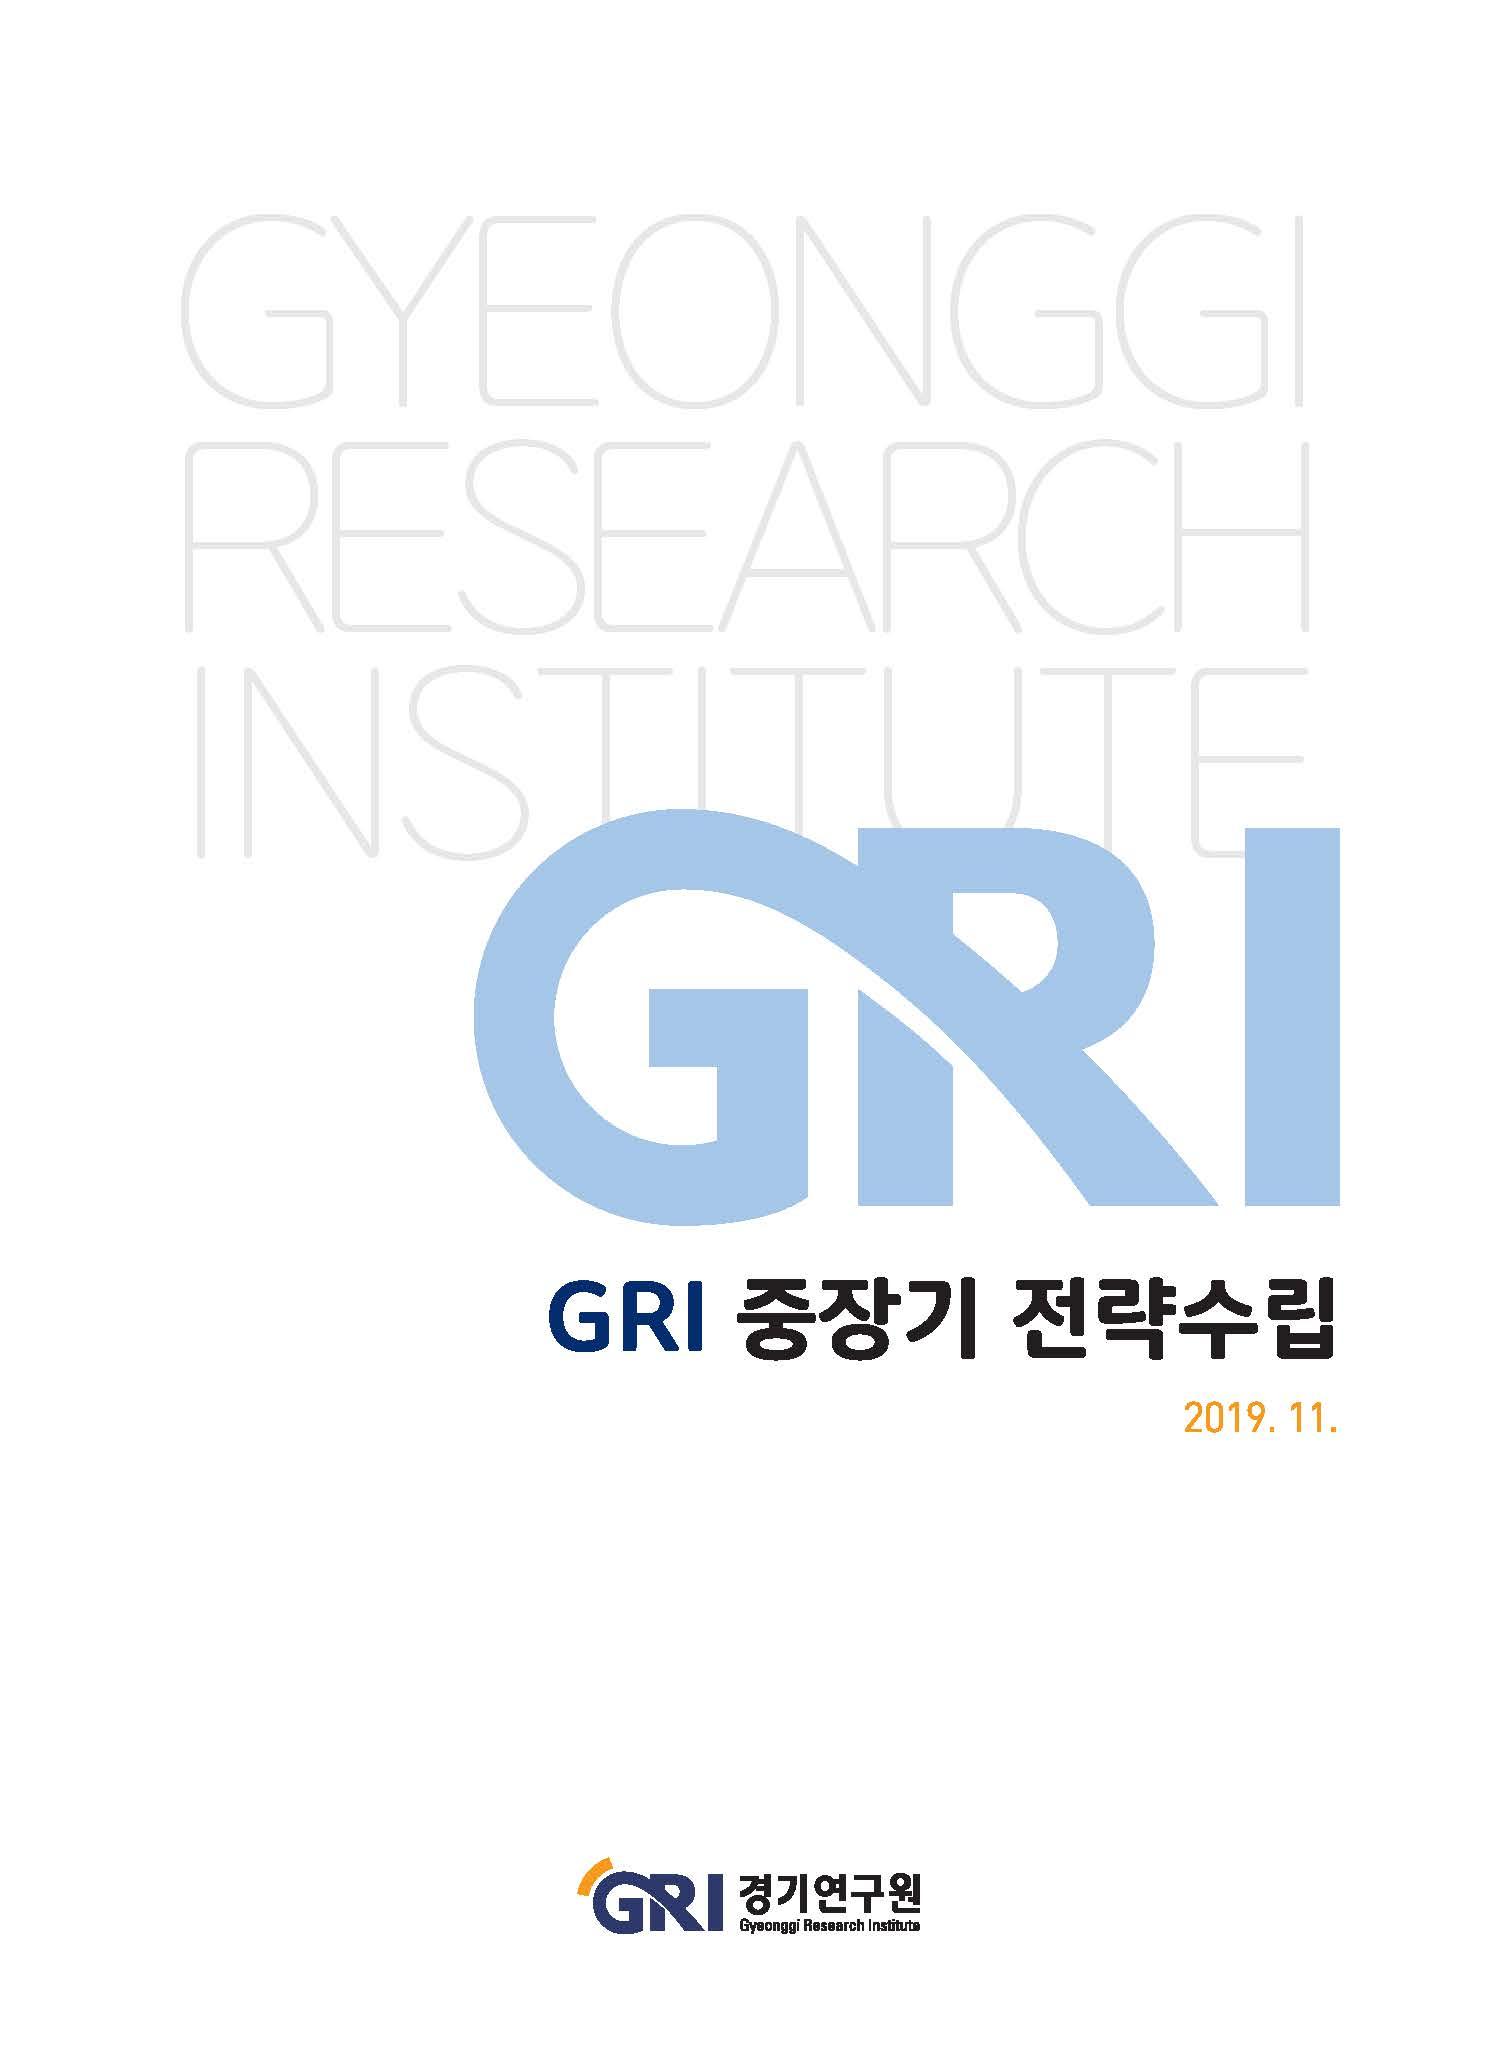 GRI 중장기 전략 수립